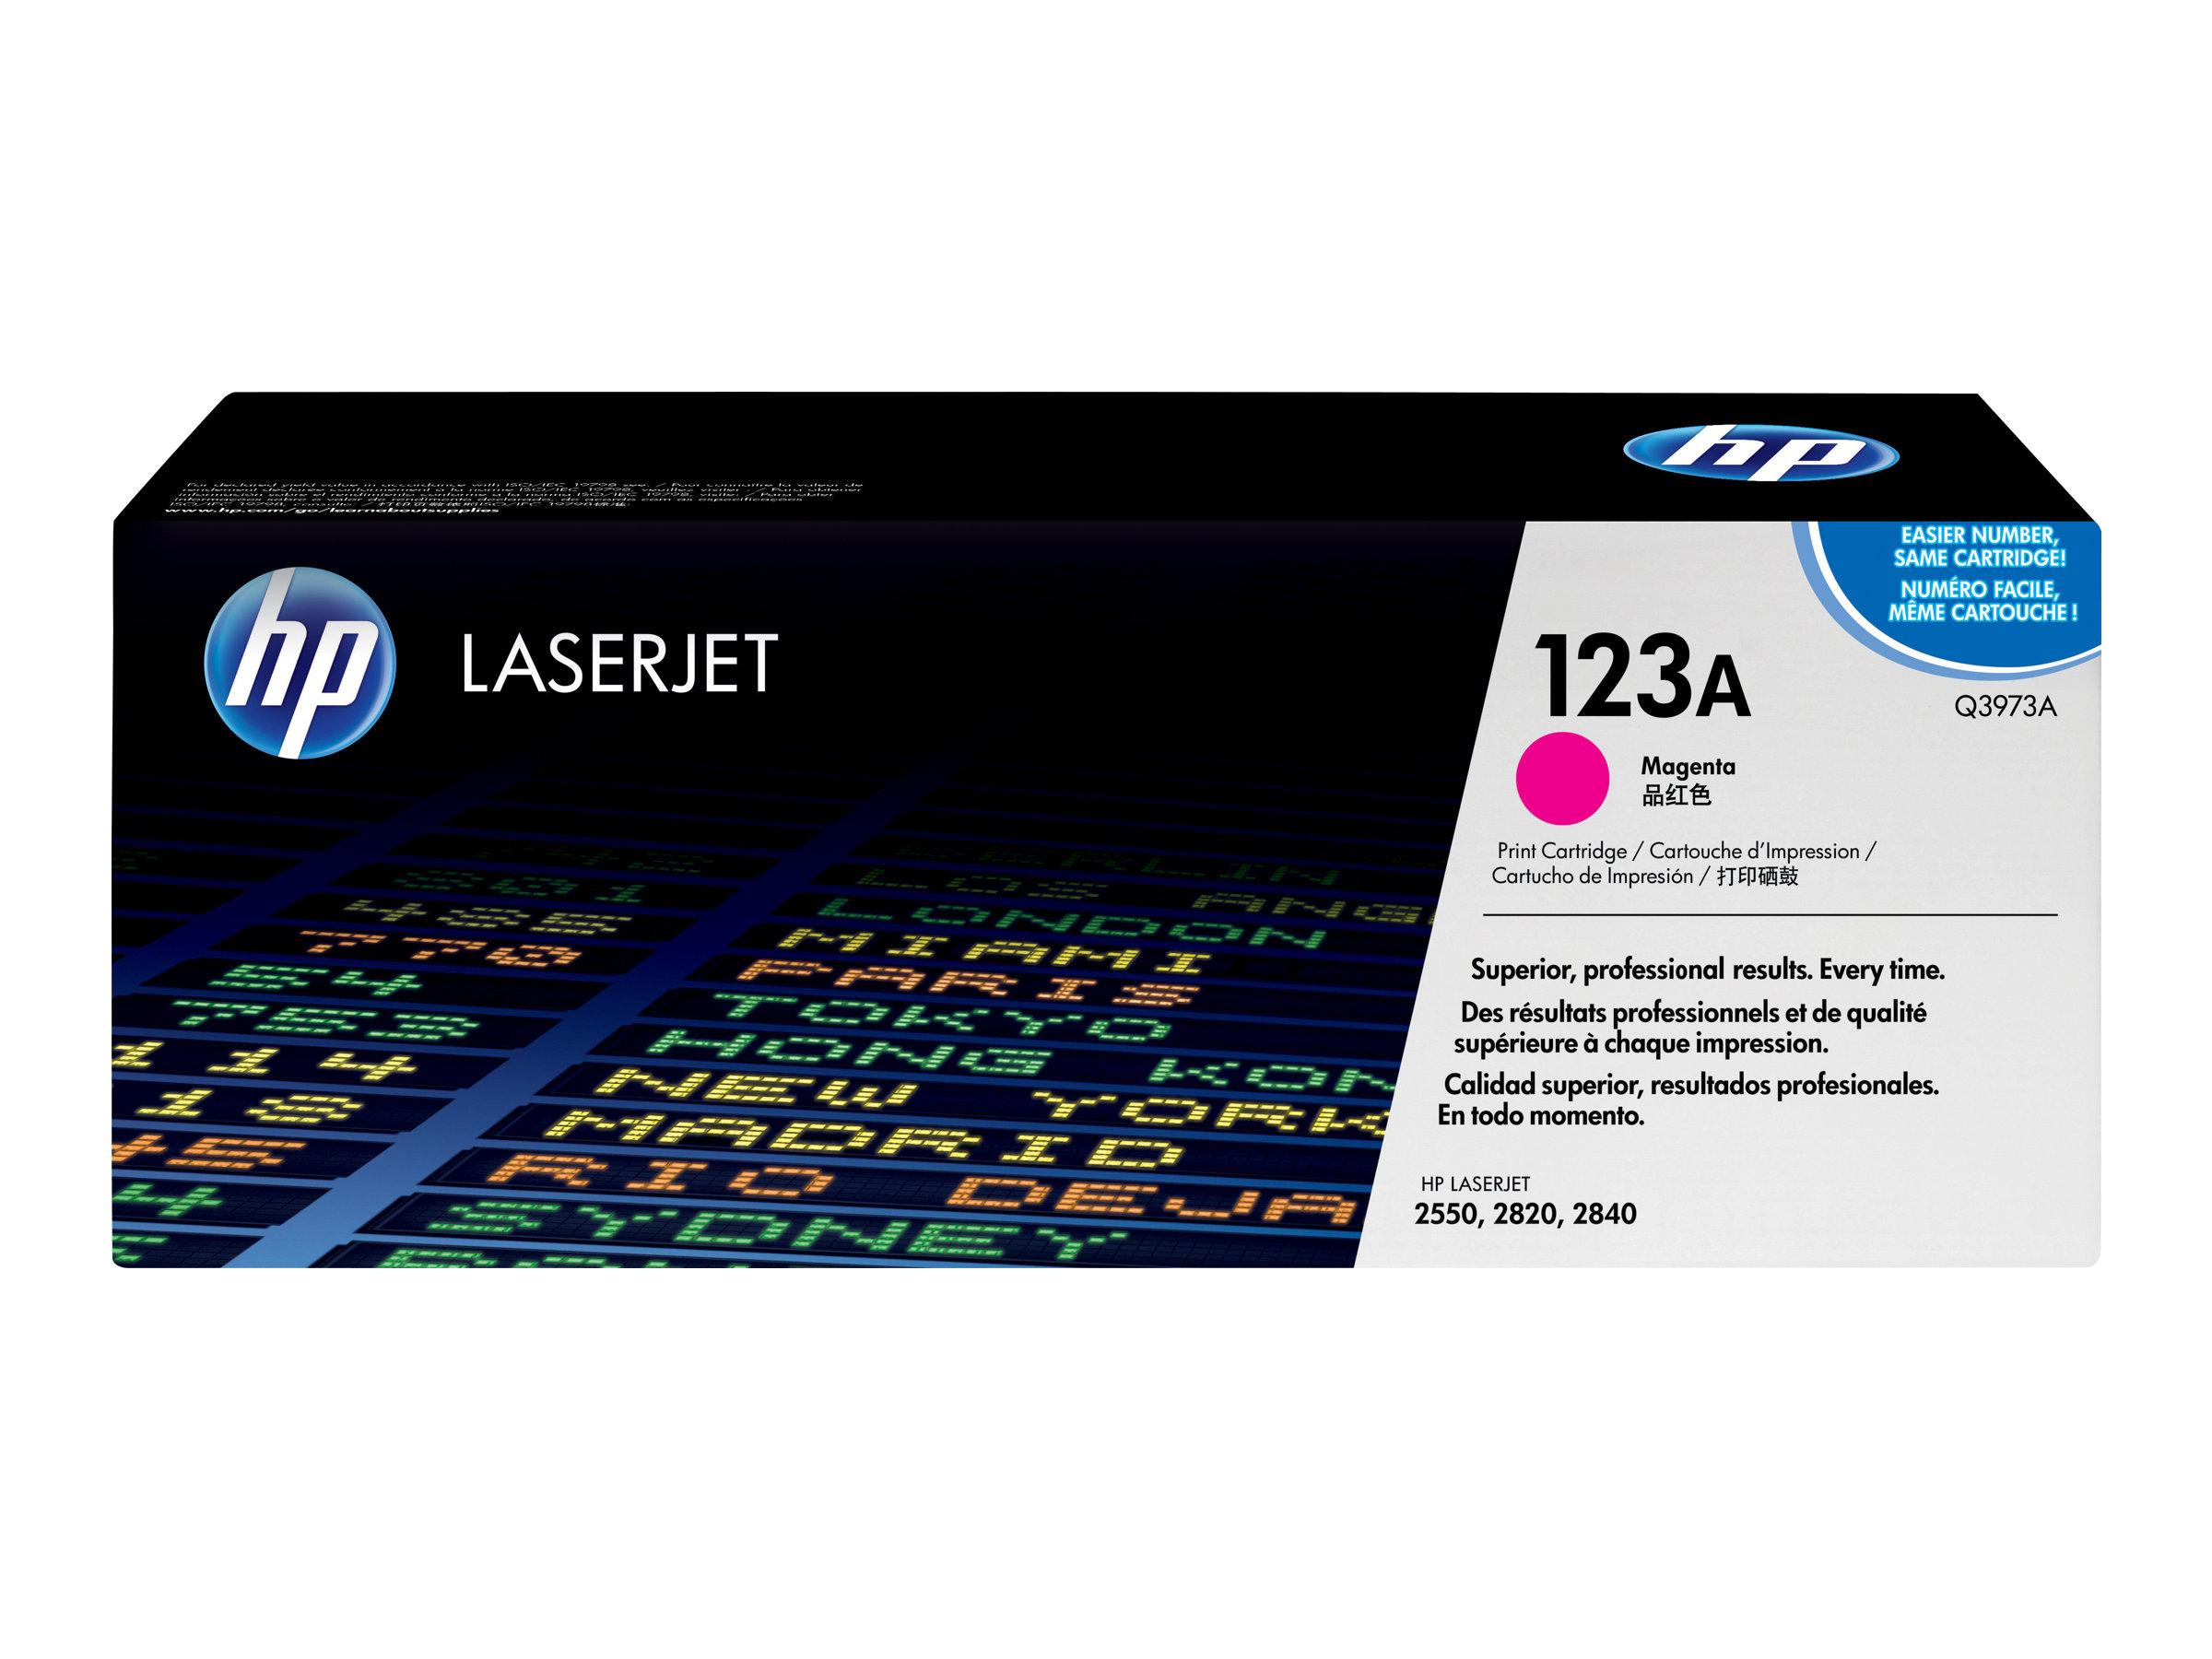 HP 123A - Magenta - Original - LaserJet - Tonerpatrone (Q3973A) - für Color LaserJet 2550L, 2550Ln, 2550n, 2820, 2830, 2840